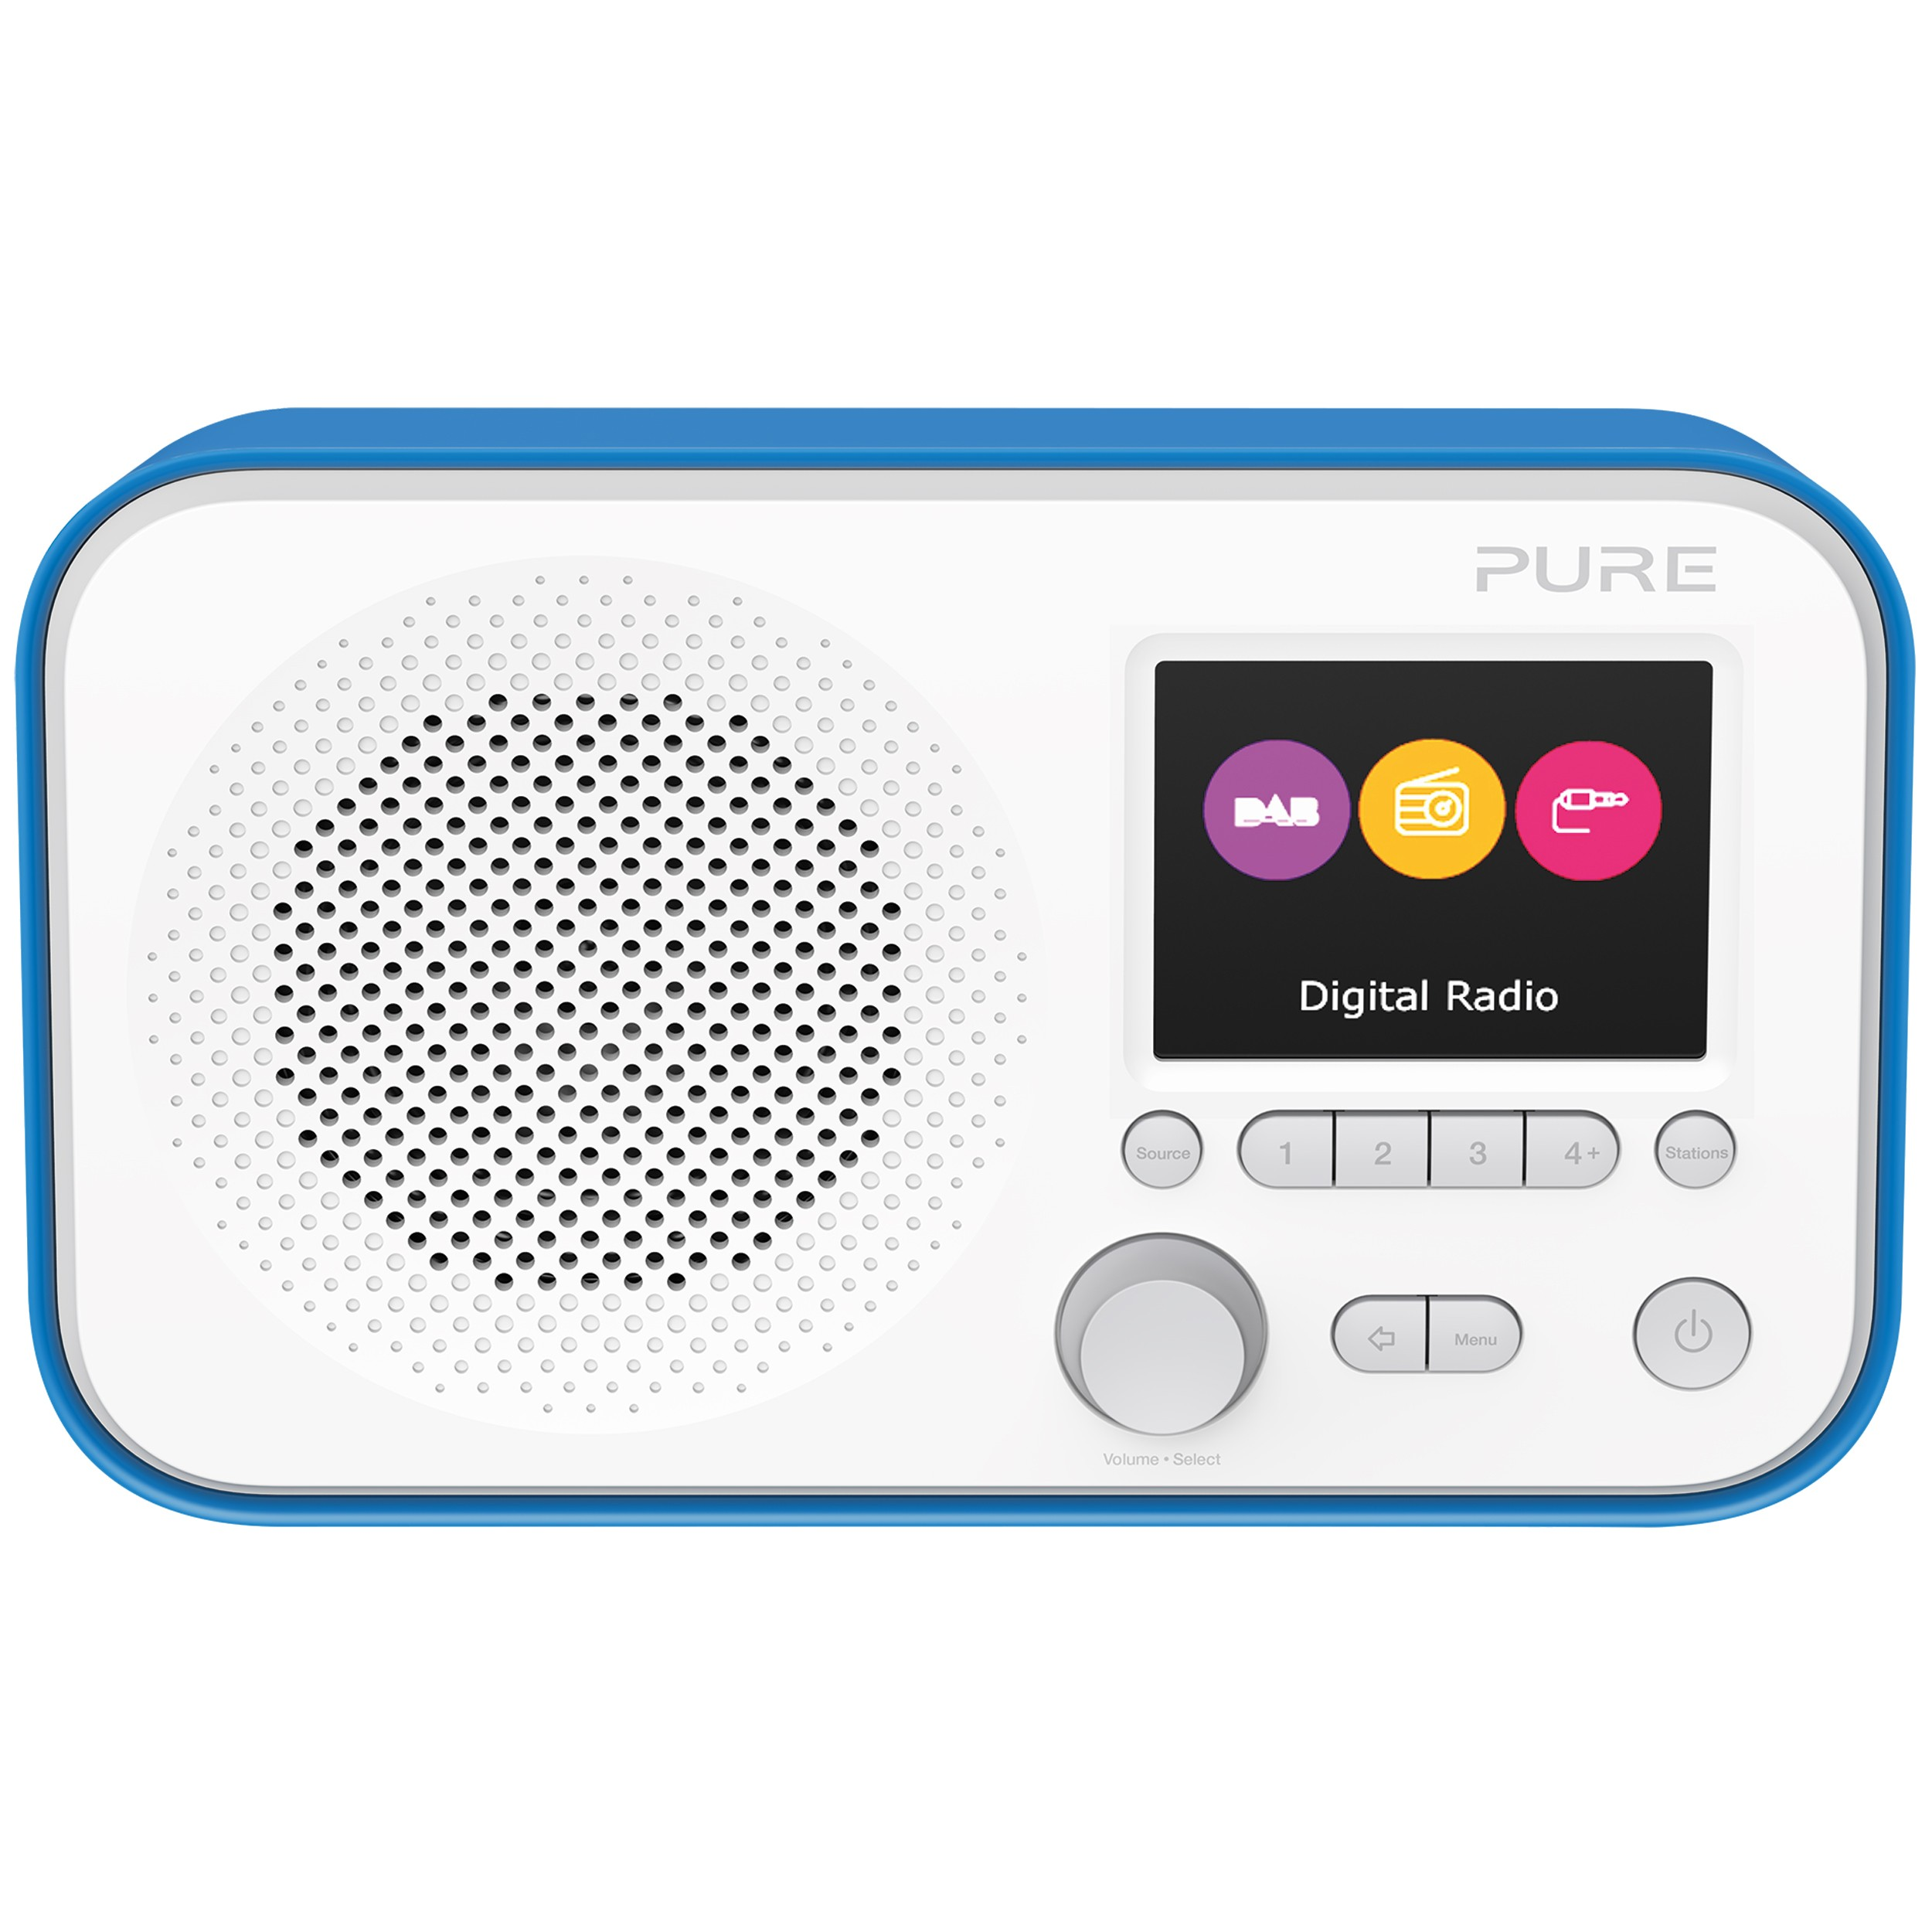 VL-62953 : Pure Elan E3 portabel DAB-radio (blå)